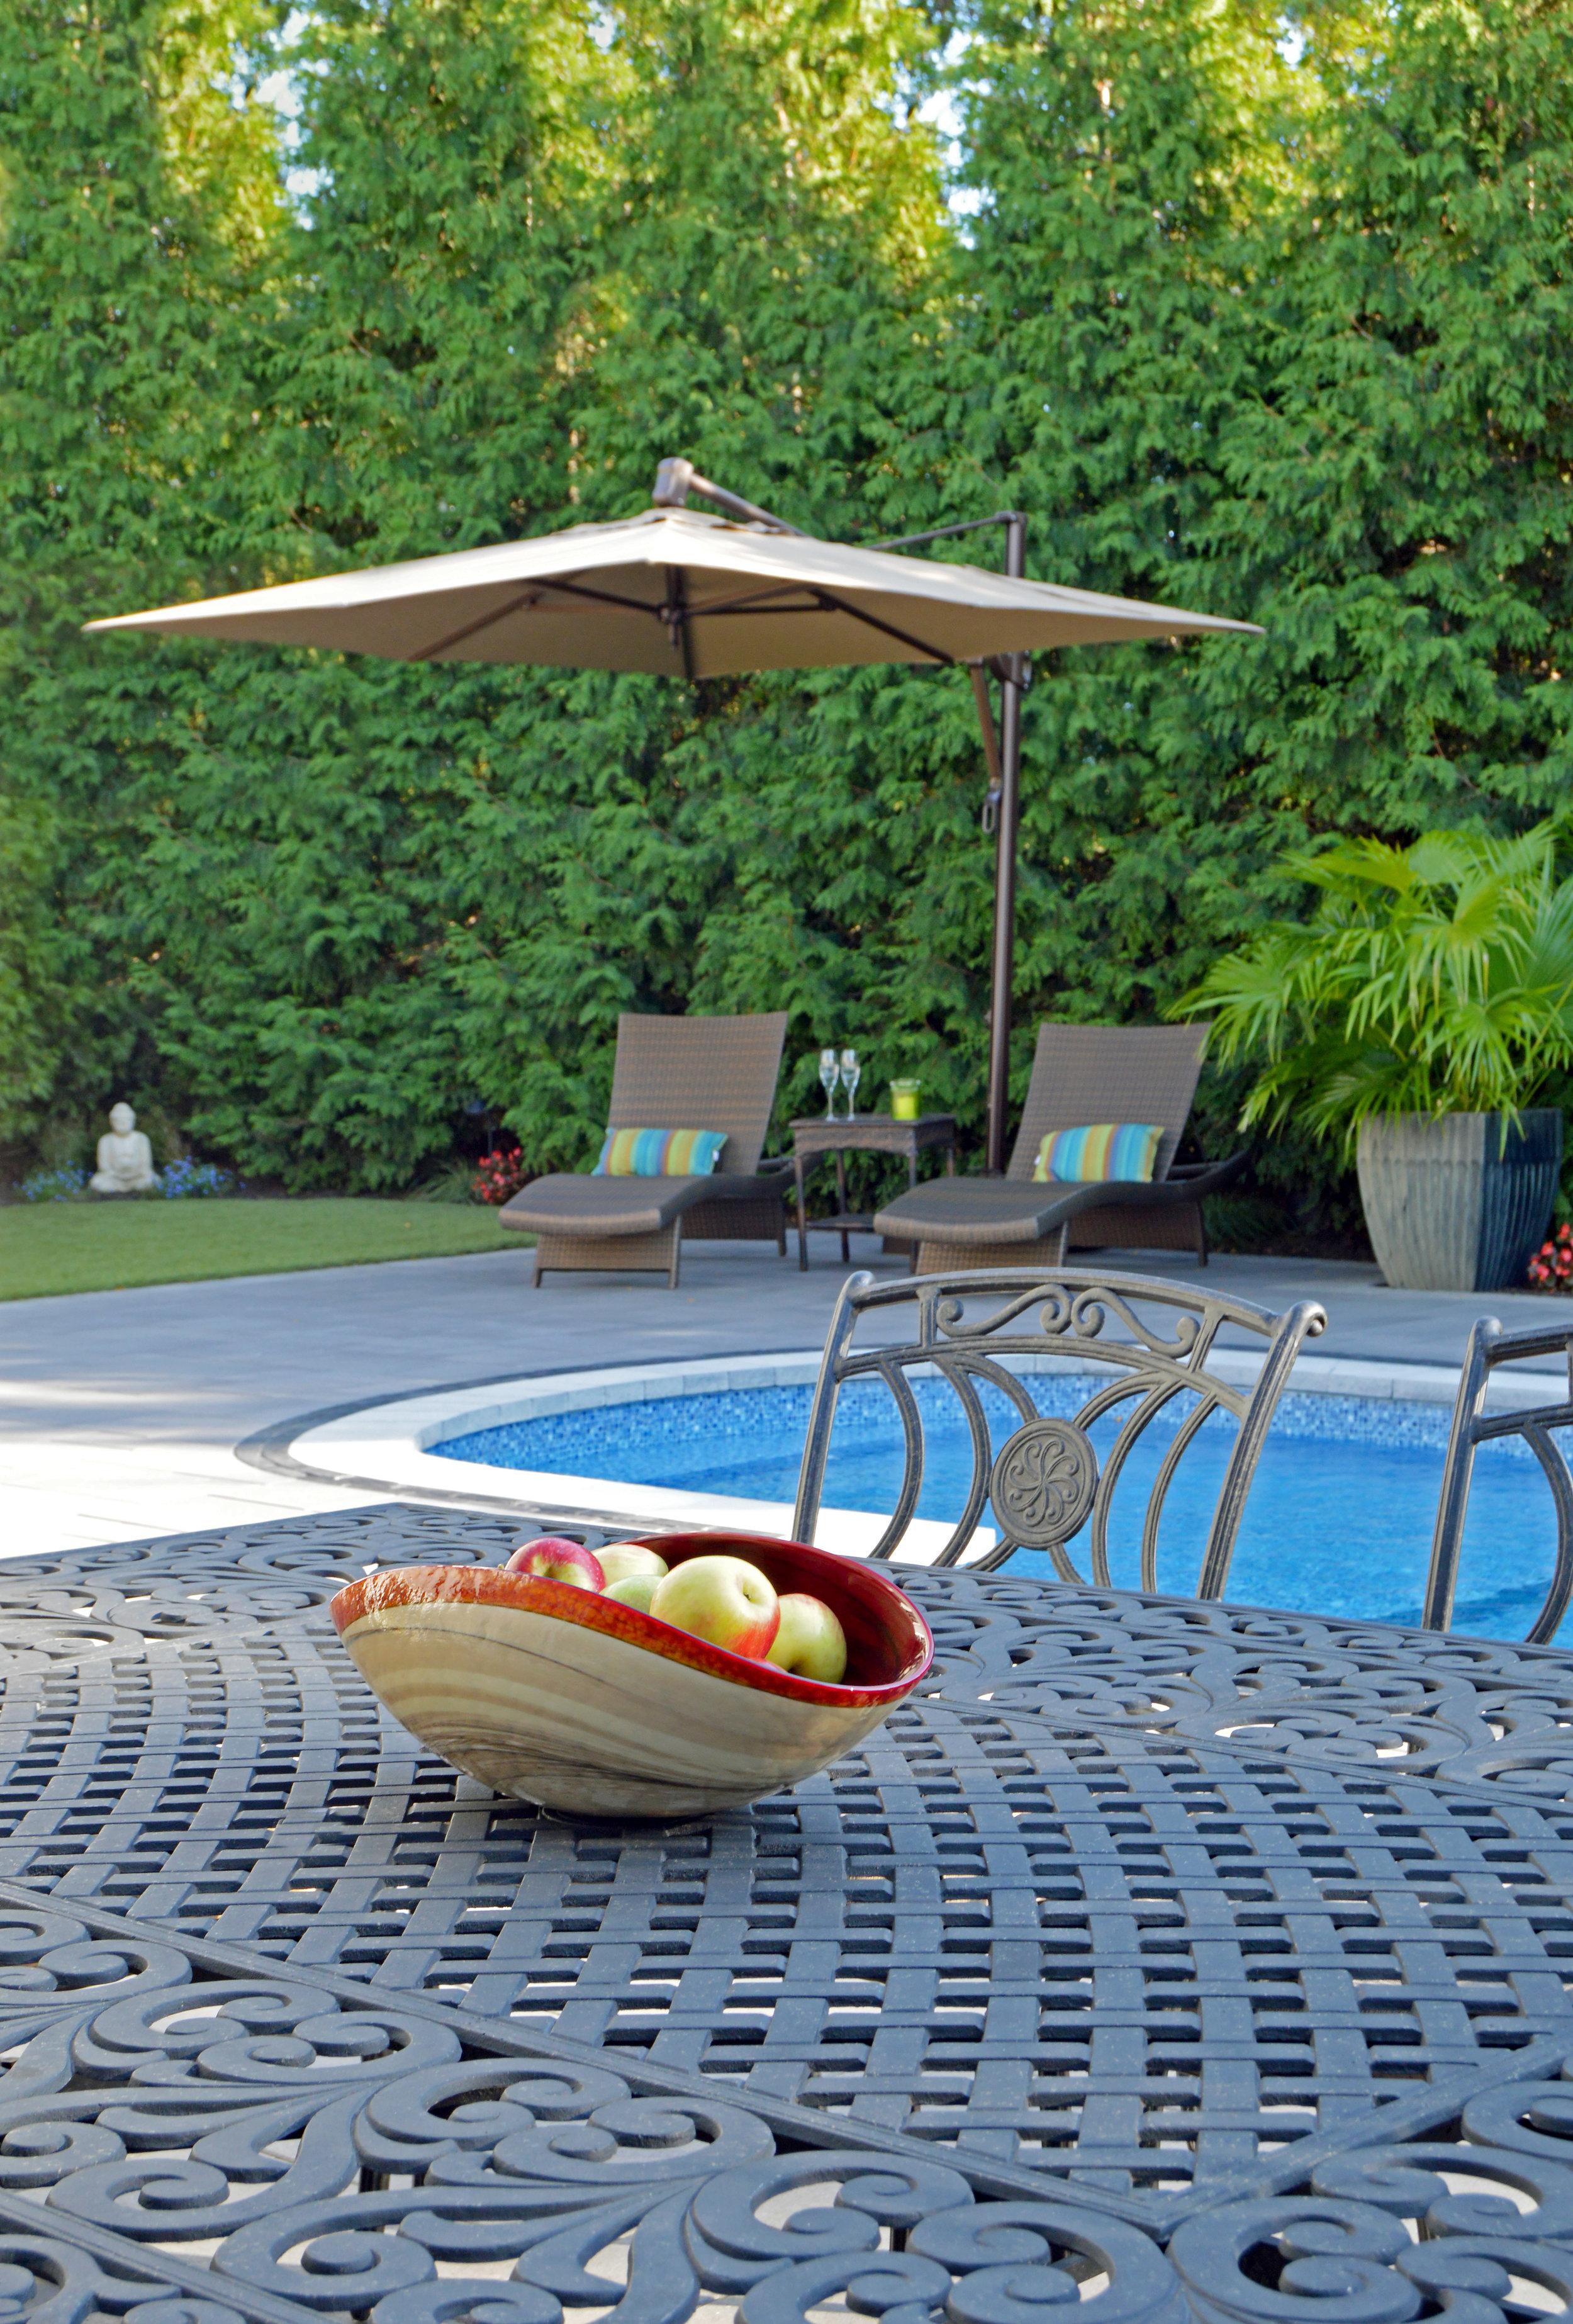 hicksville, NY outdoor dining area landscape design